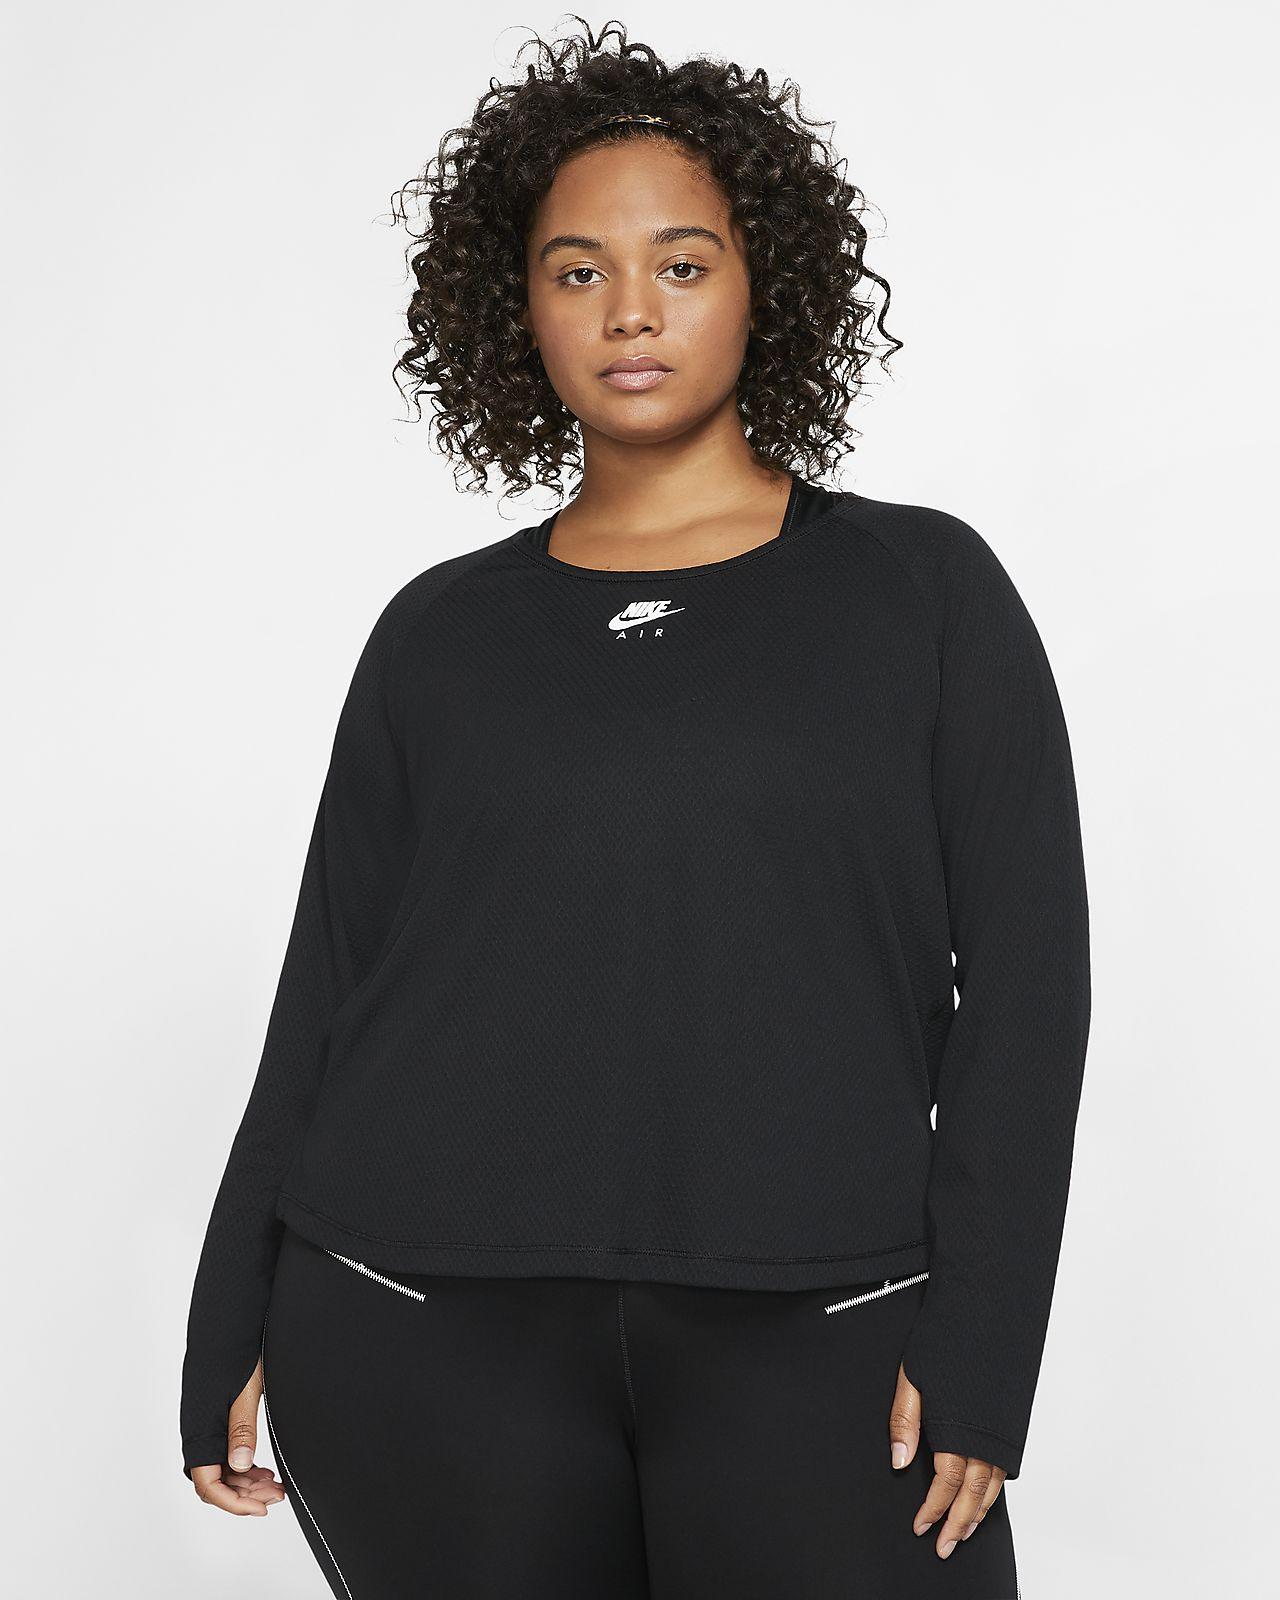 Nike Women's Long-Sleeve Running Top (Plus Size)